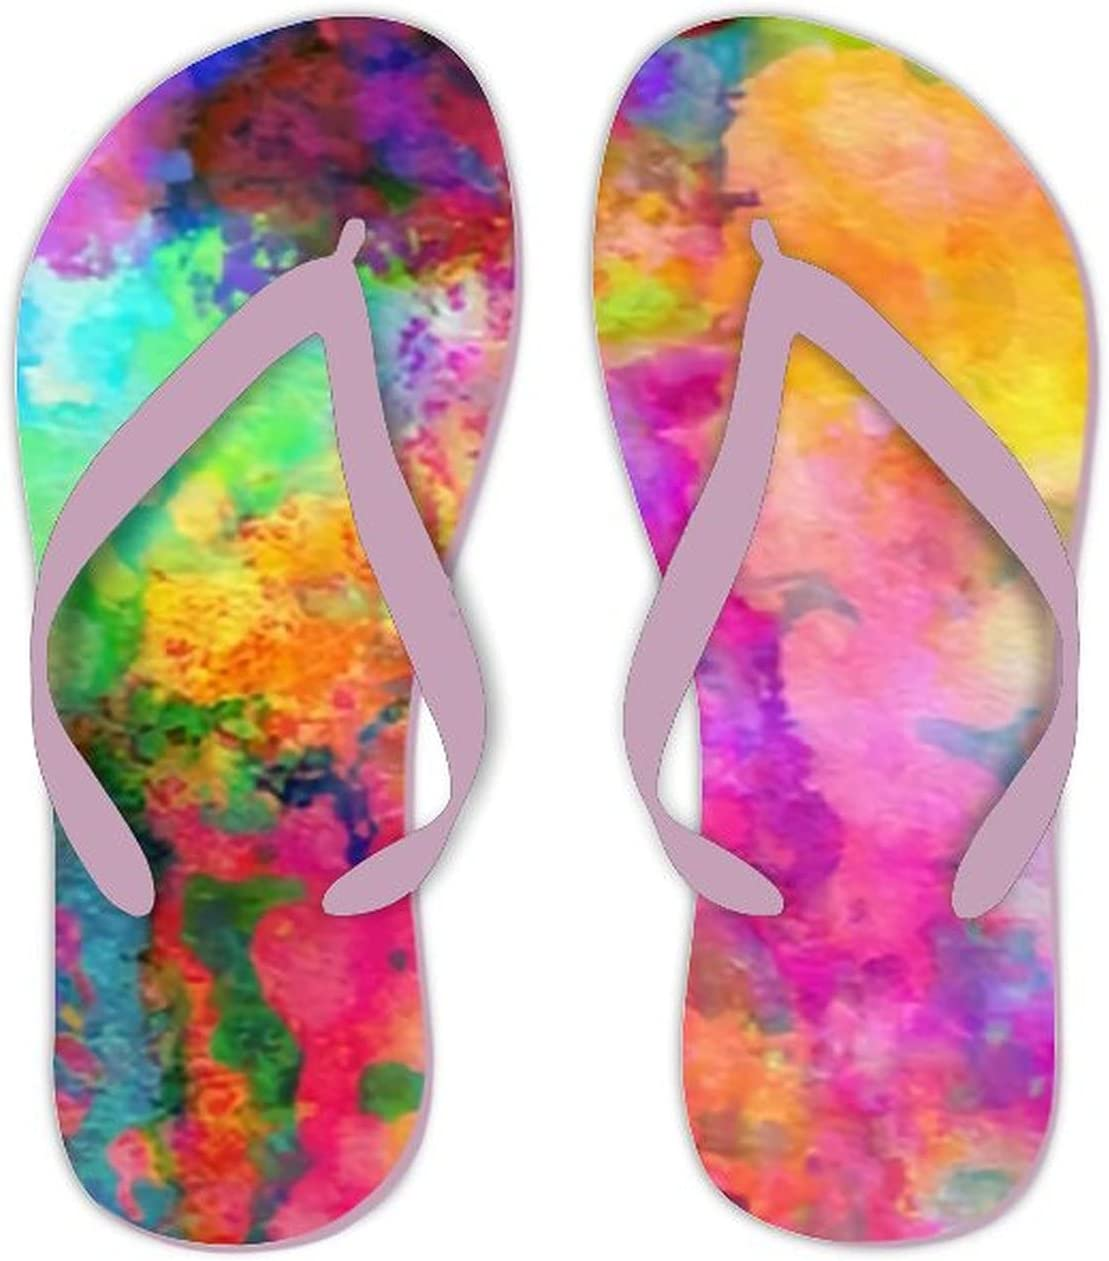 UTF4C Summer Flip Flops for Men Women Colorful Abstract Composition Soft Lightweight Non Slip Sandals for Shower Beach Pool Bathroom Flat 10